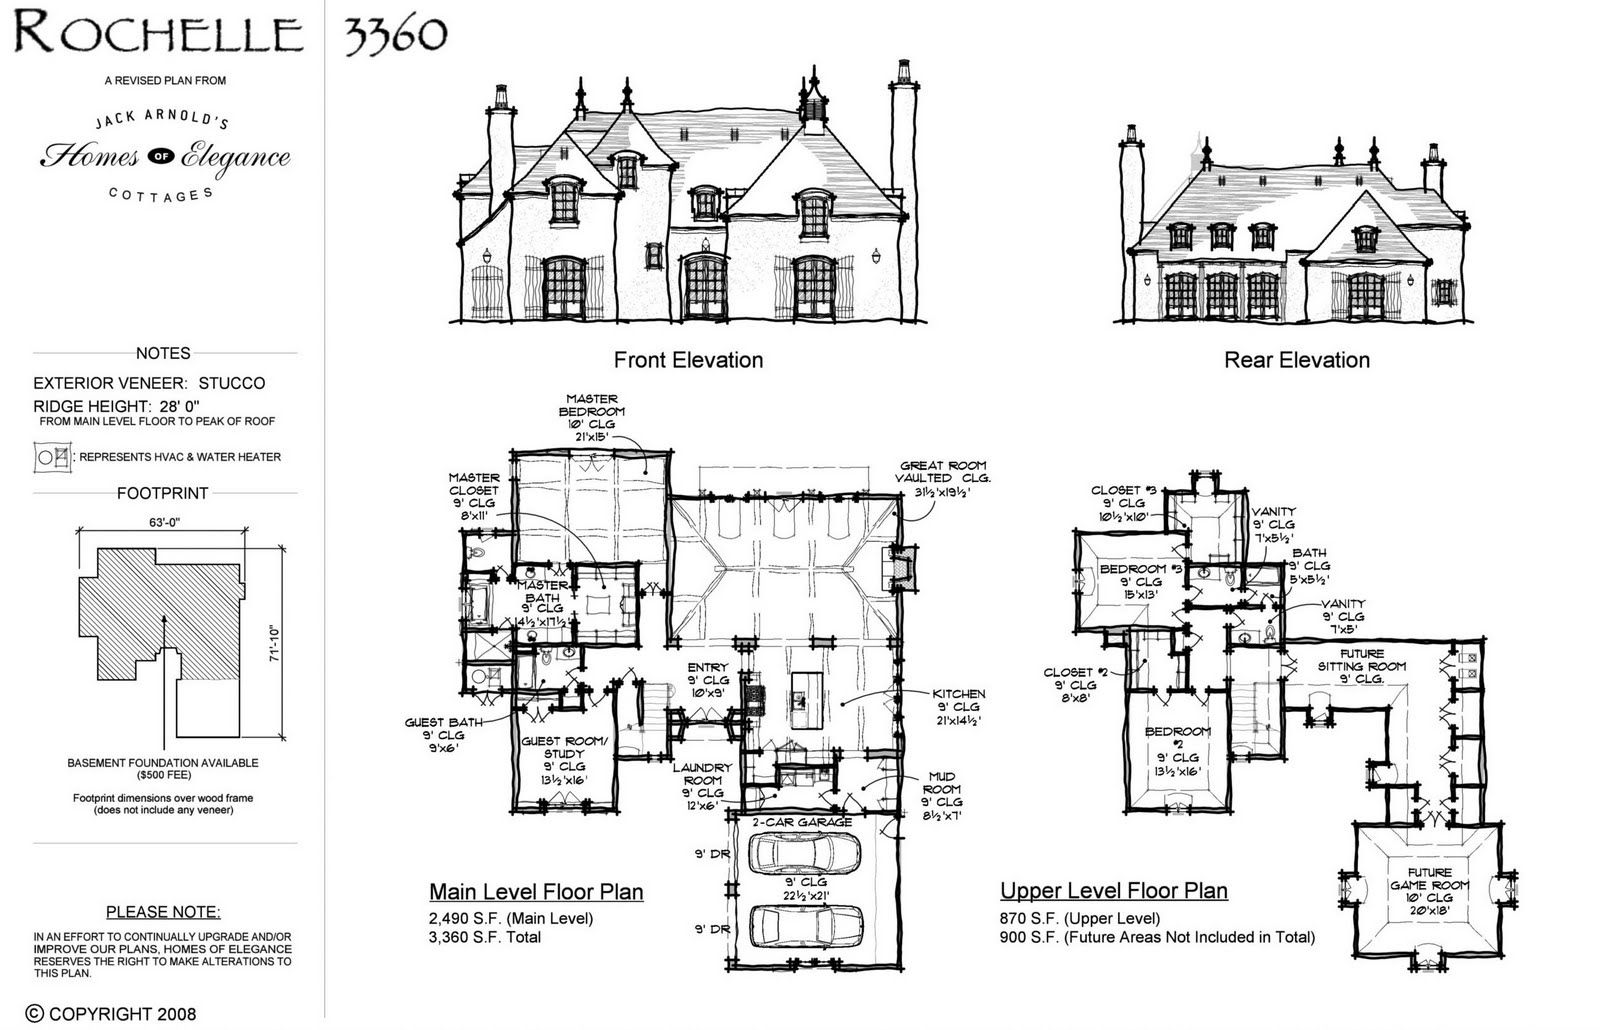 Rochelle Jack Arnold S Homes Of Elegance Arnold House House Plans Home Design Floor Plans